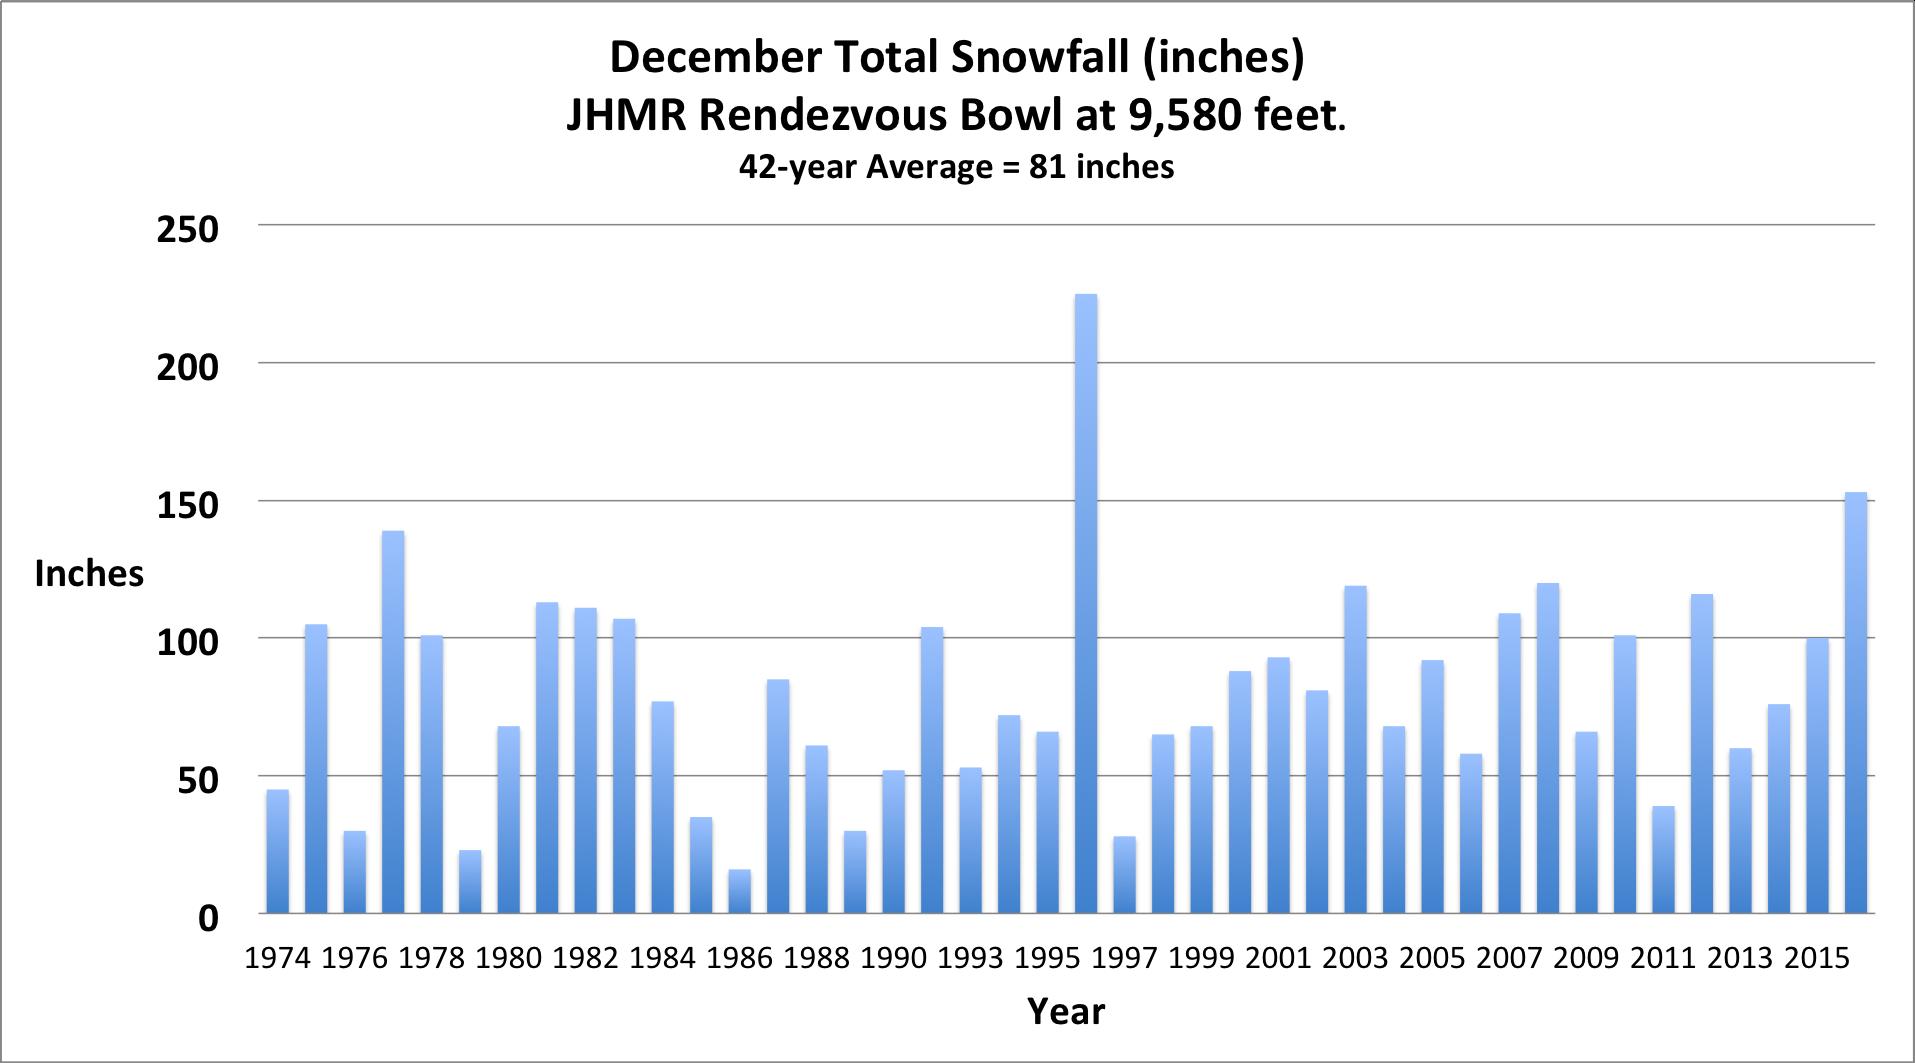 2-Rendezvous Bowl December Snowfall